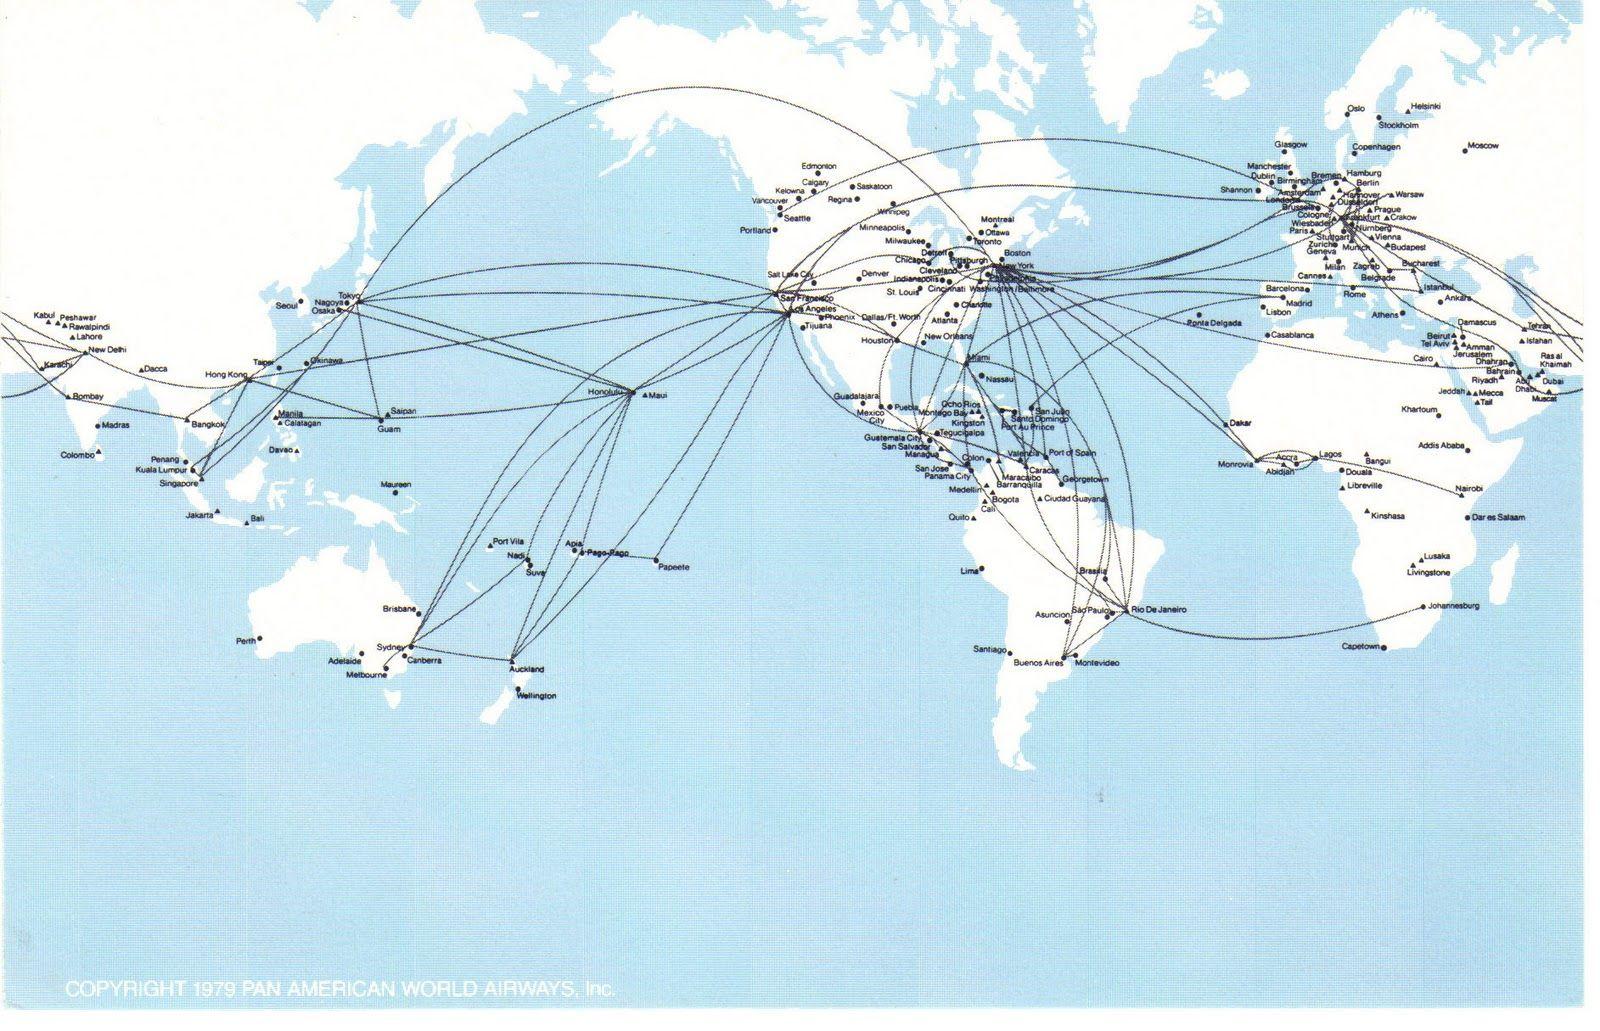 Panampostcardmapjpg Airline Routes Pinterest - Us airways europe route map